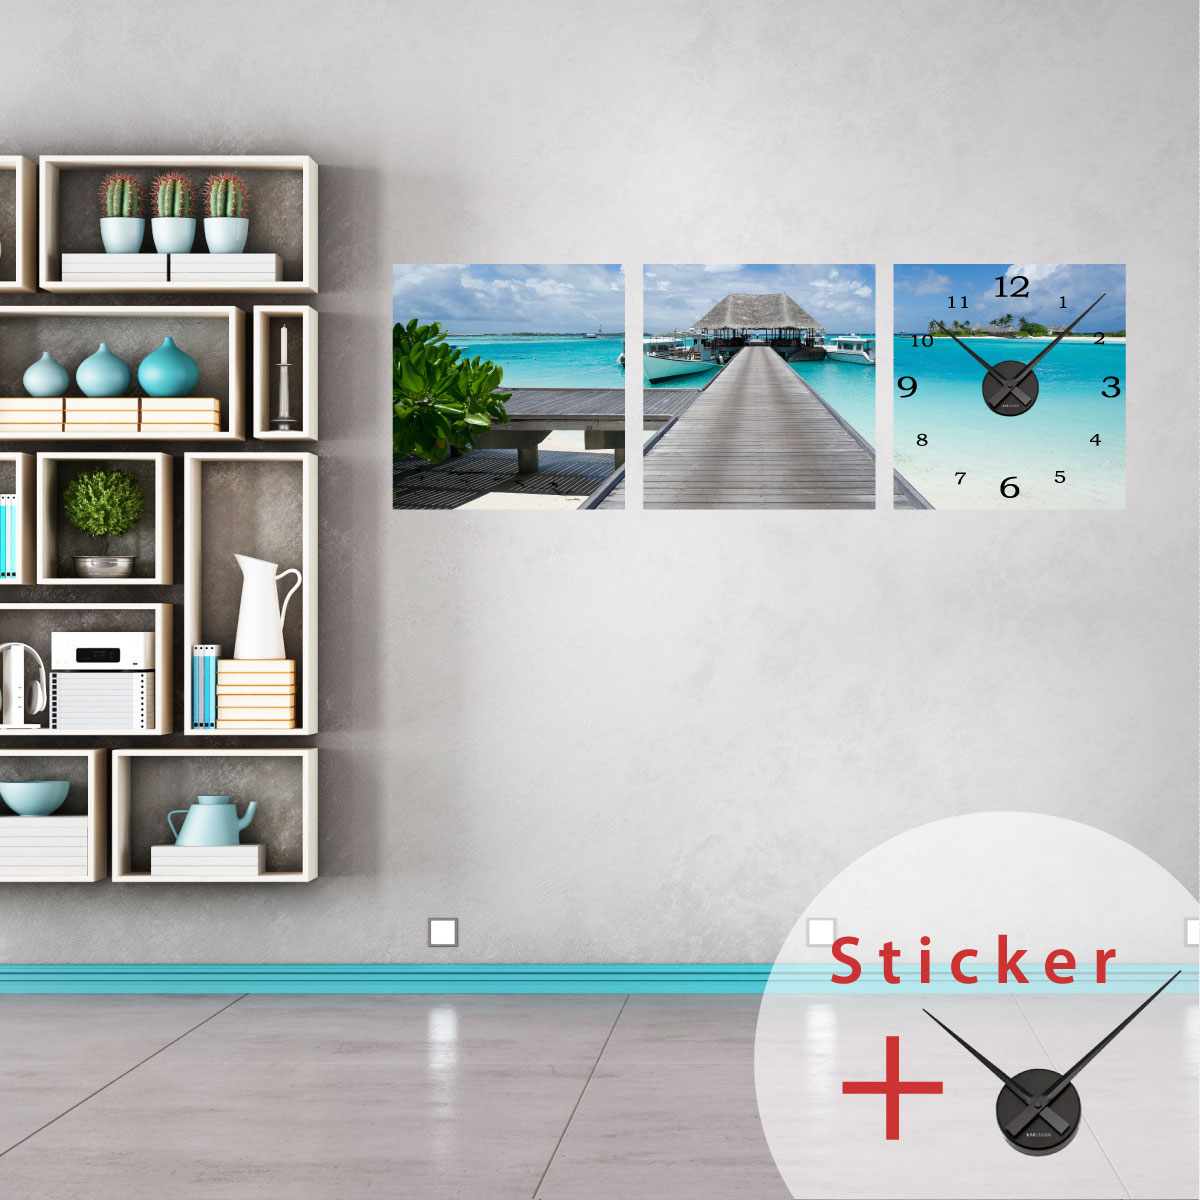 Sticker horloge vue sur une plage tropicale stickers for Plage stickers muraux